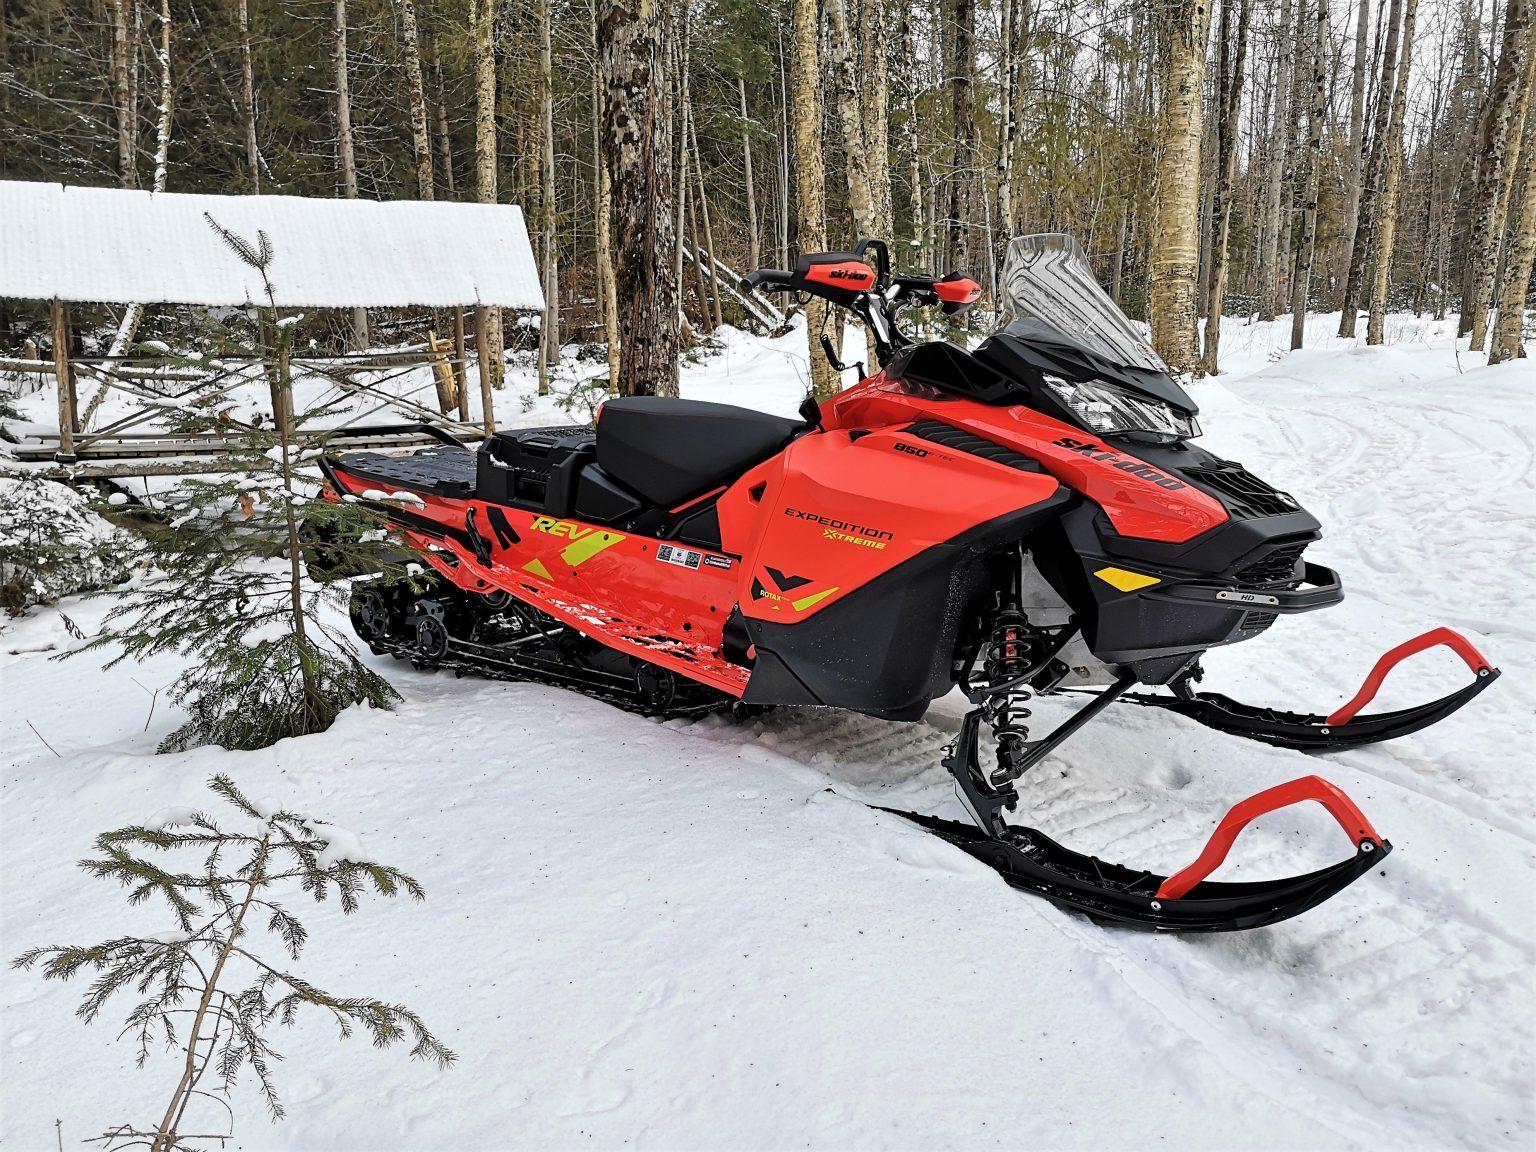 Ski-Doo Expedition Xtreme 2020 - Analyse pré-randonnée